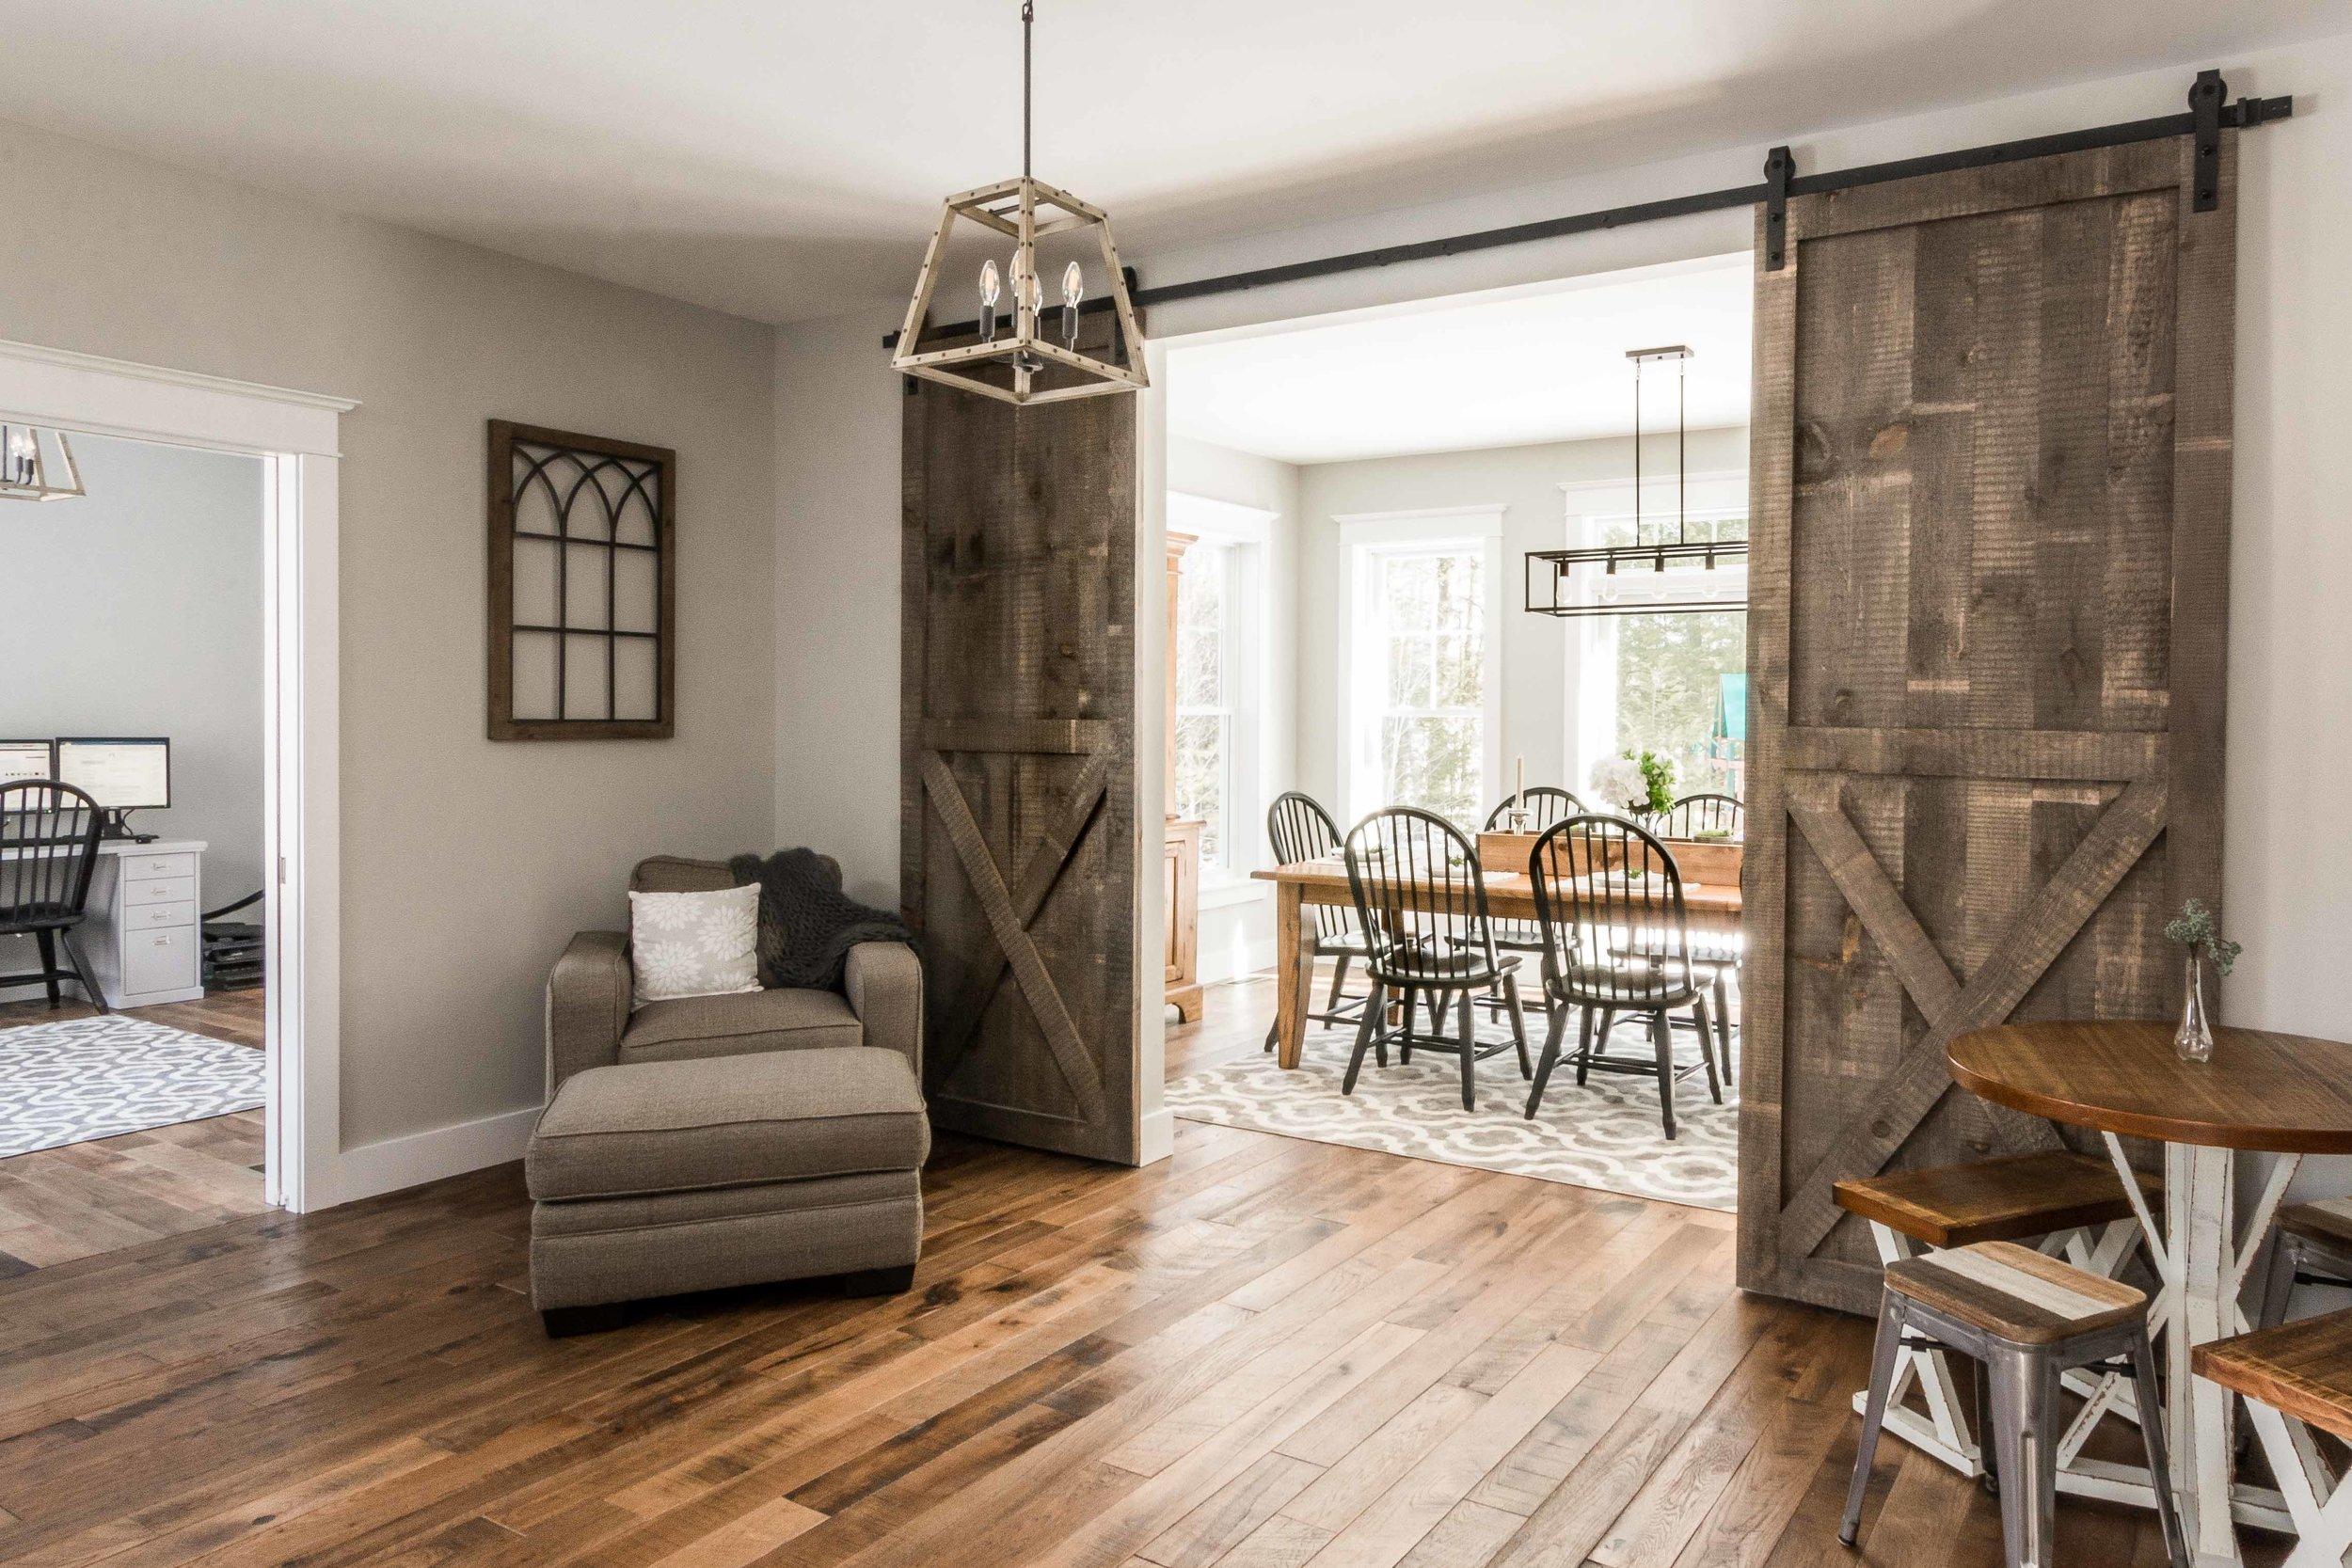 Birchwood Farmhouse, Gorham, Maine, Kitchen and Dining Area